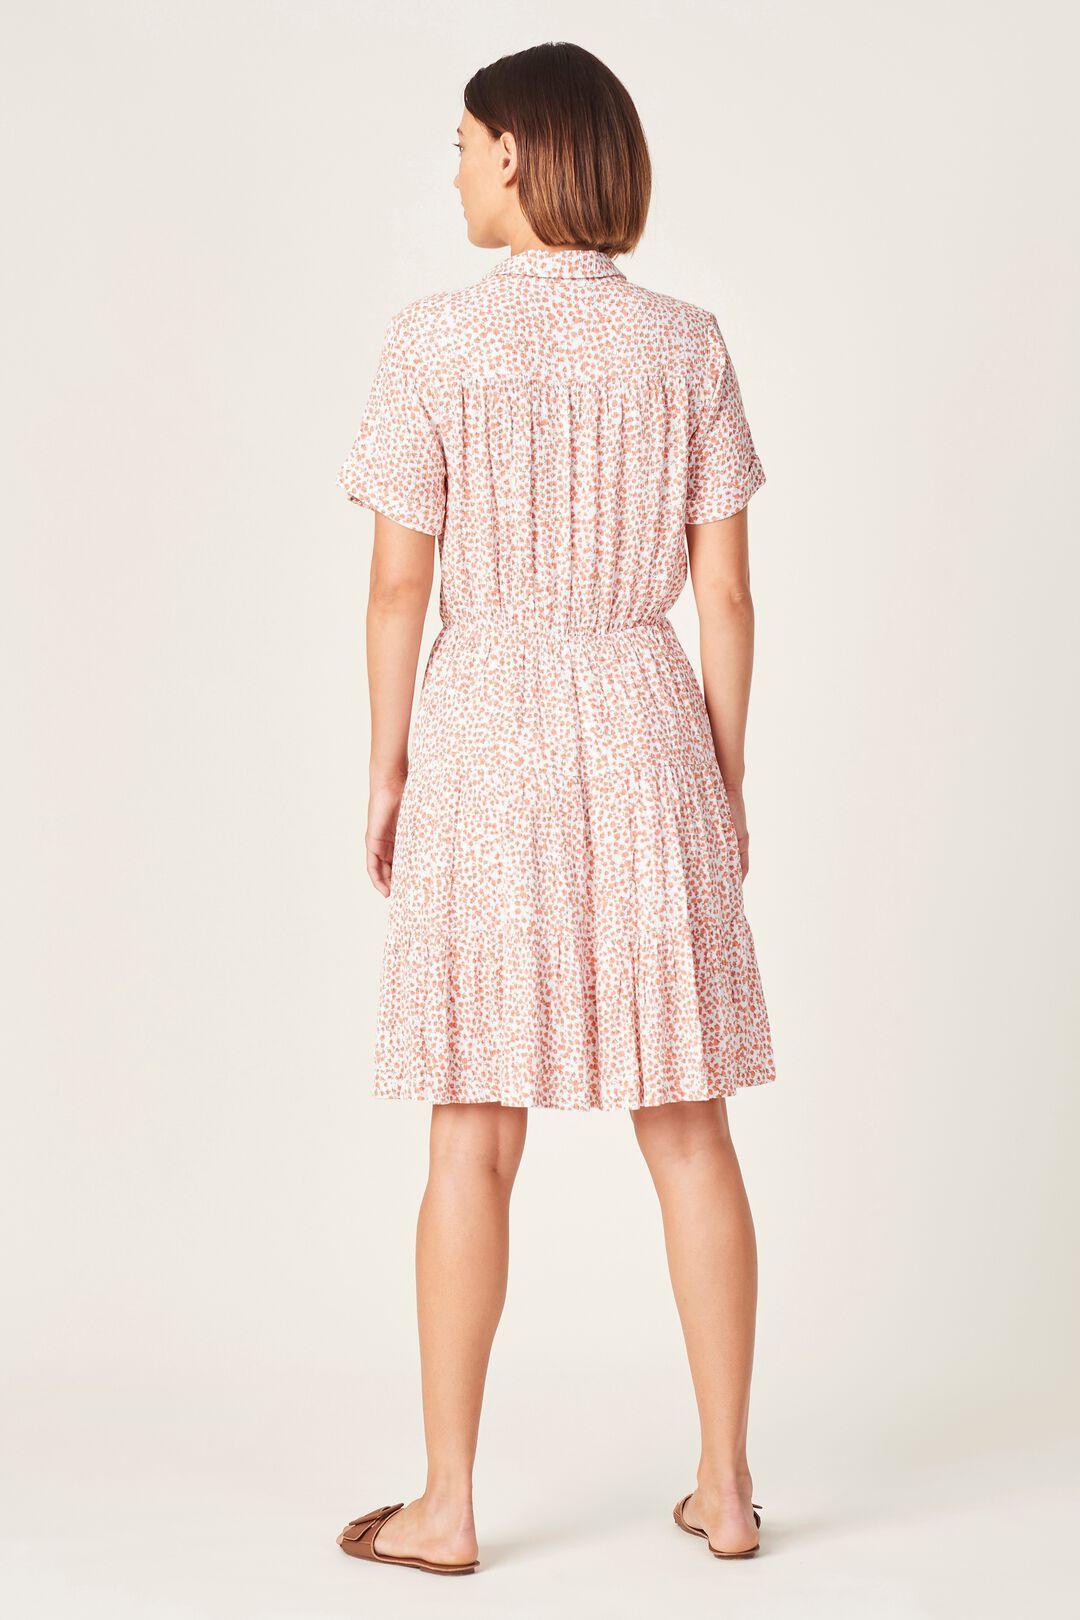 CRINKLE DITSY FLORAL DRESS  SUMMER WHITE/MULTI  hi-res